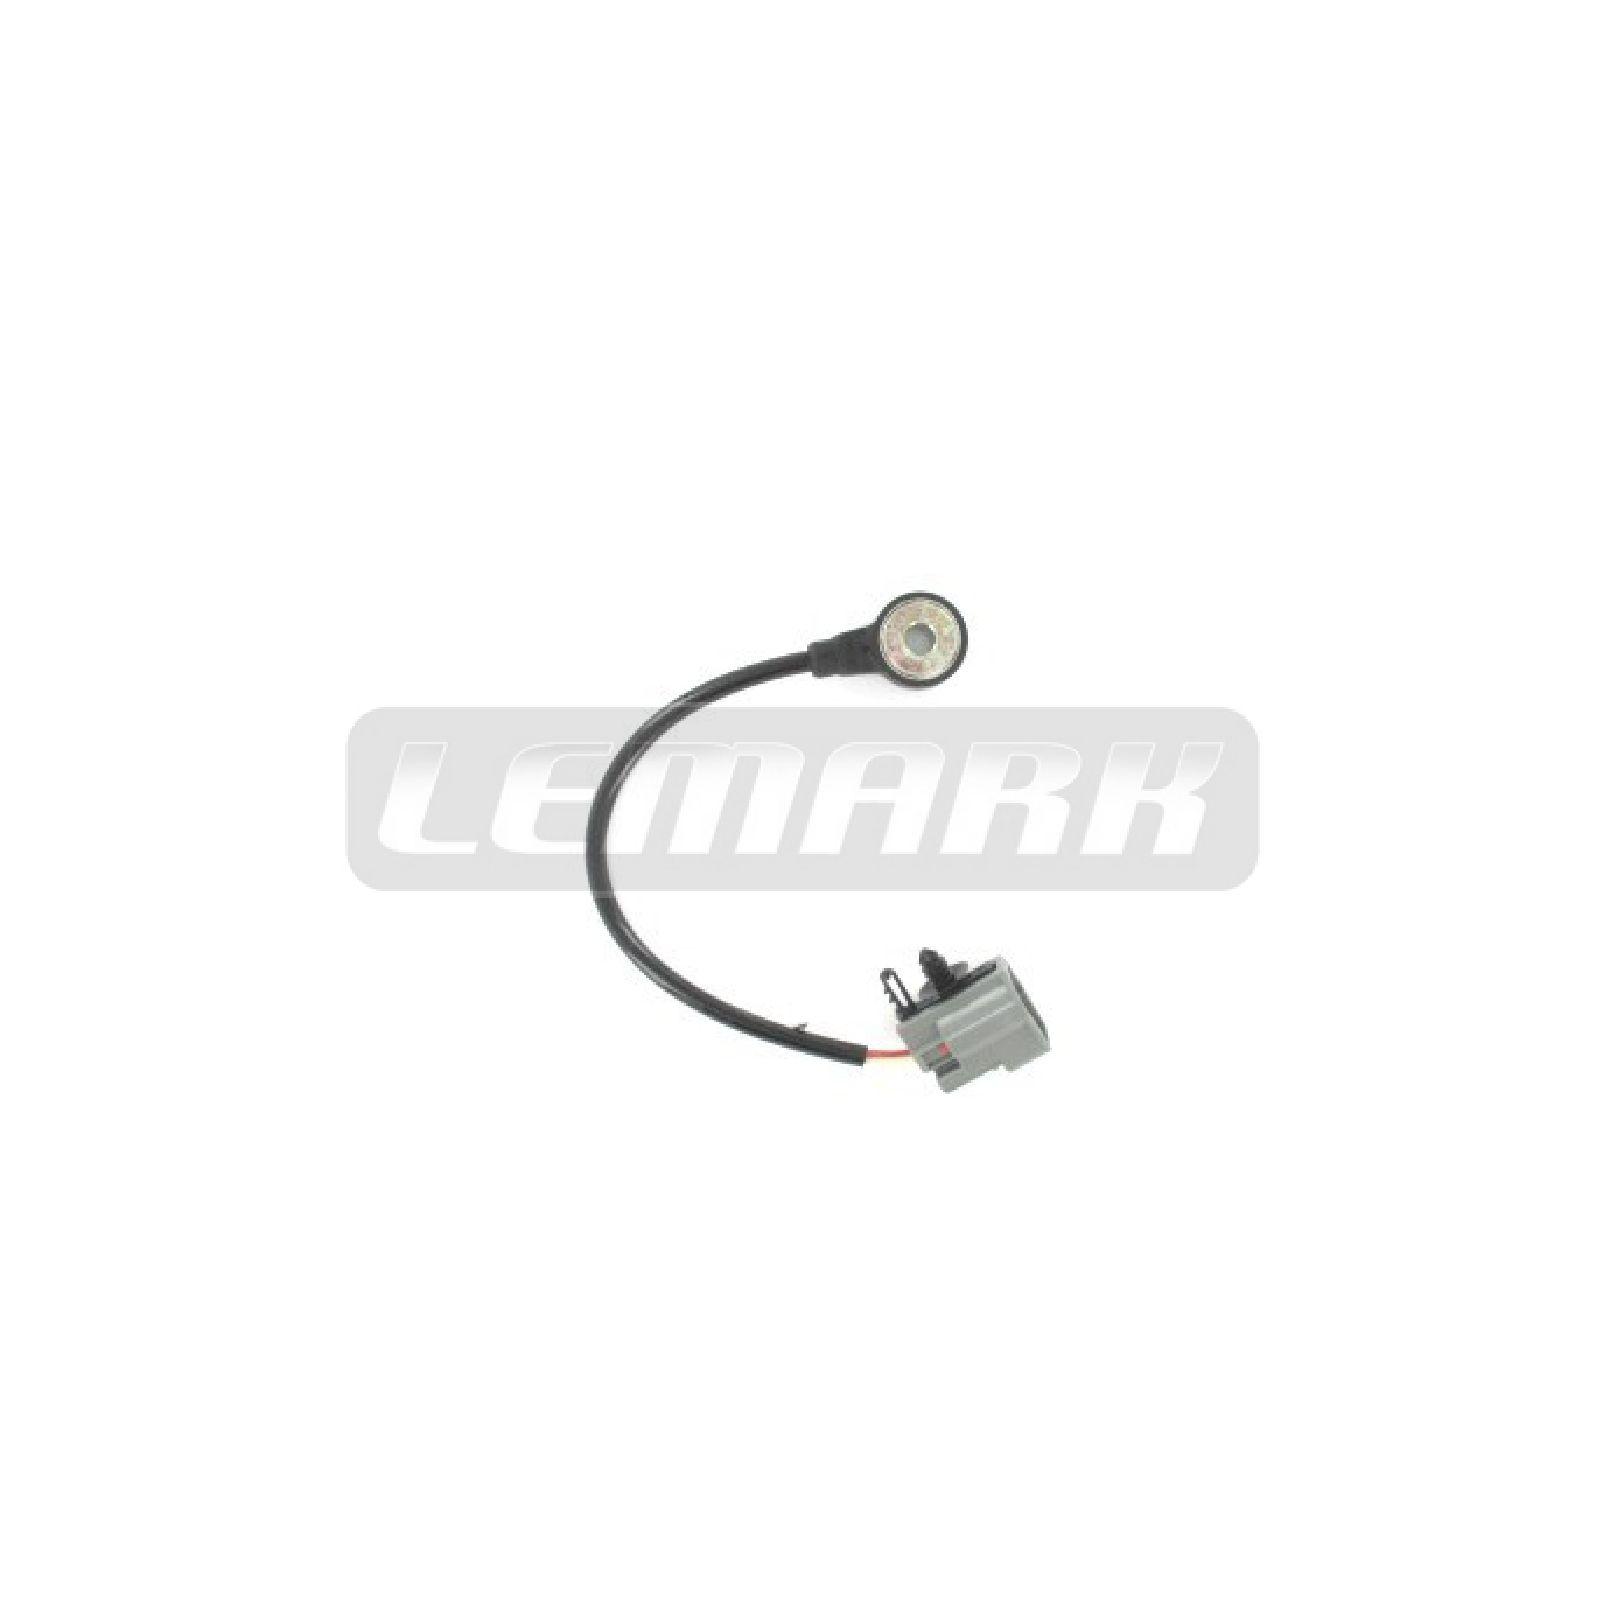 Ford-Focus-MK3-2-0-St-Genuino-Lemark-Knock-sensor-OE-Calidad-Reemplazo